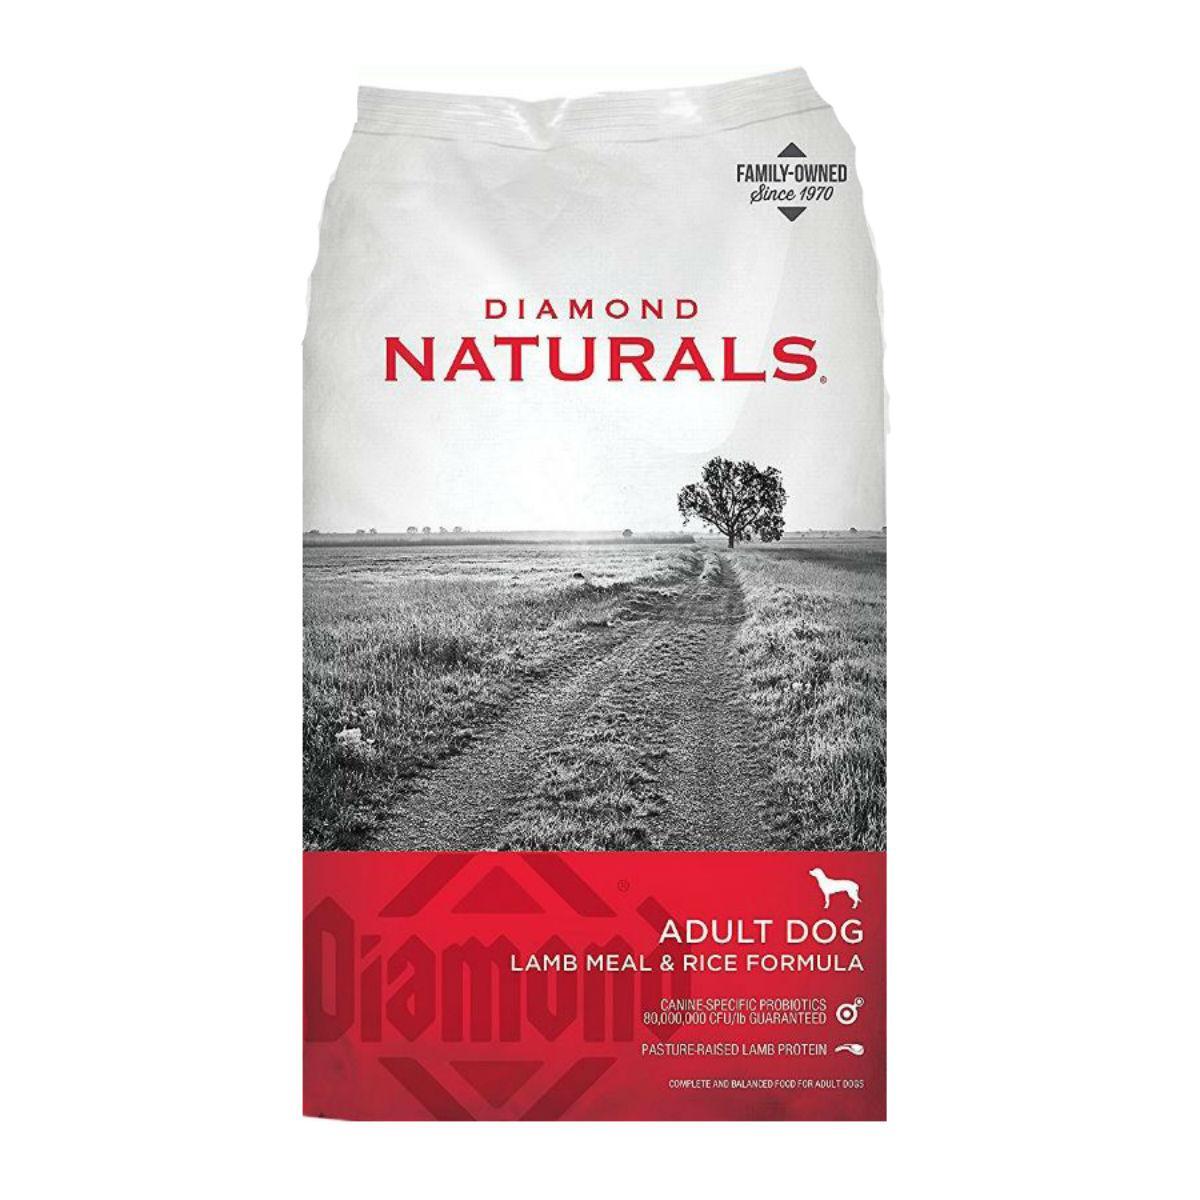 Diamond Naturals Adult Dog Food - Lamb and Rice